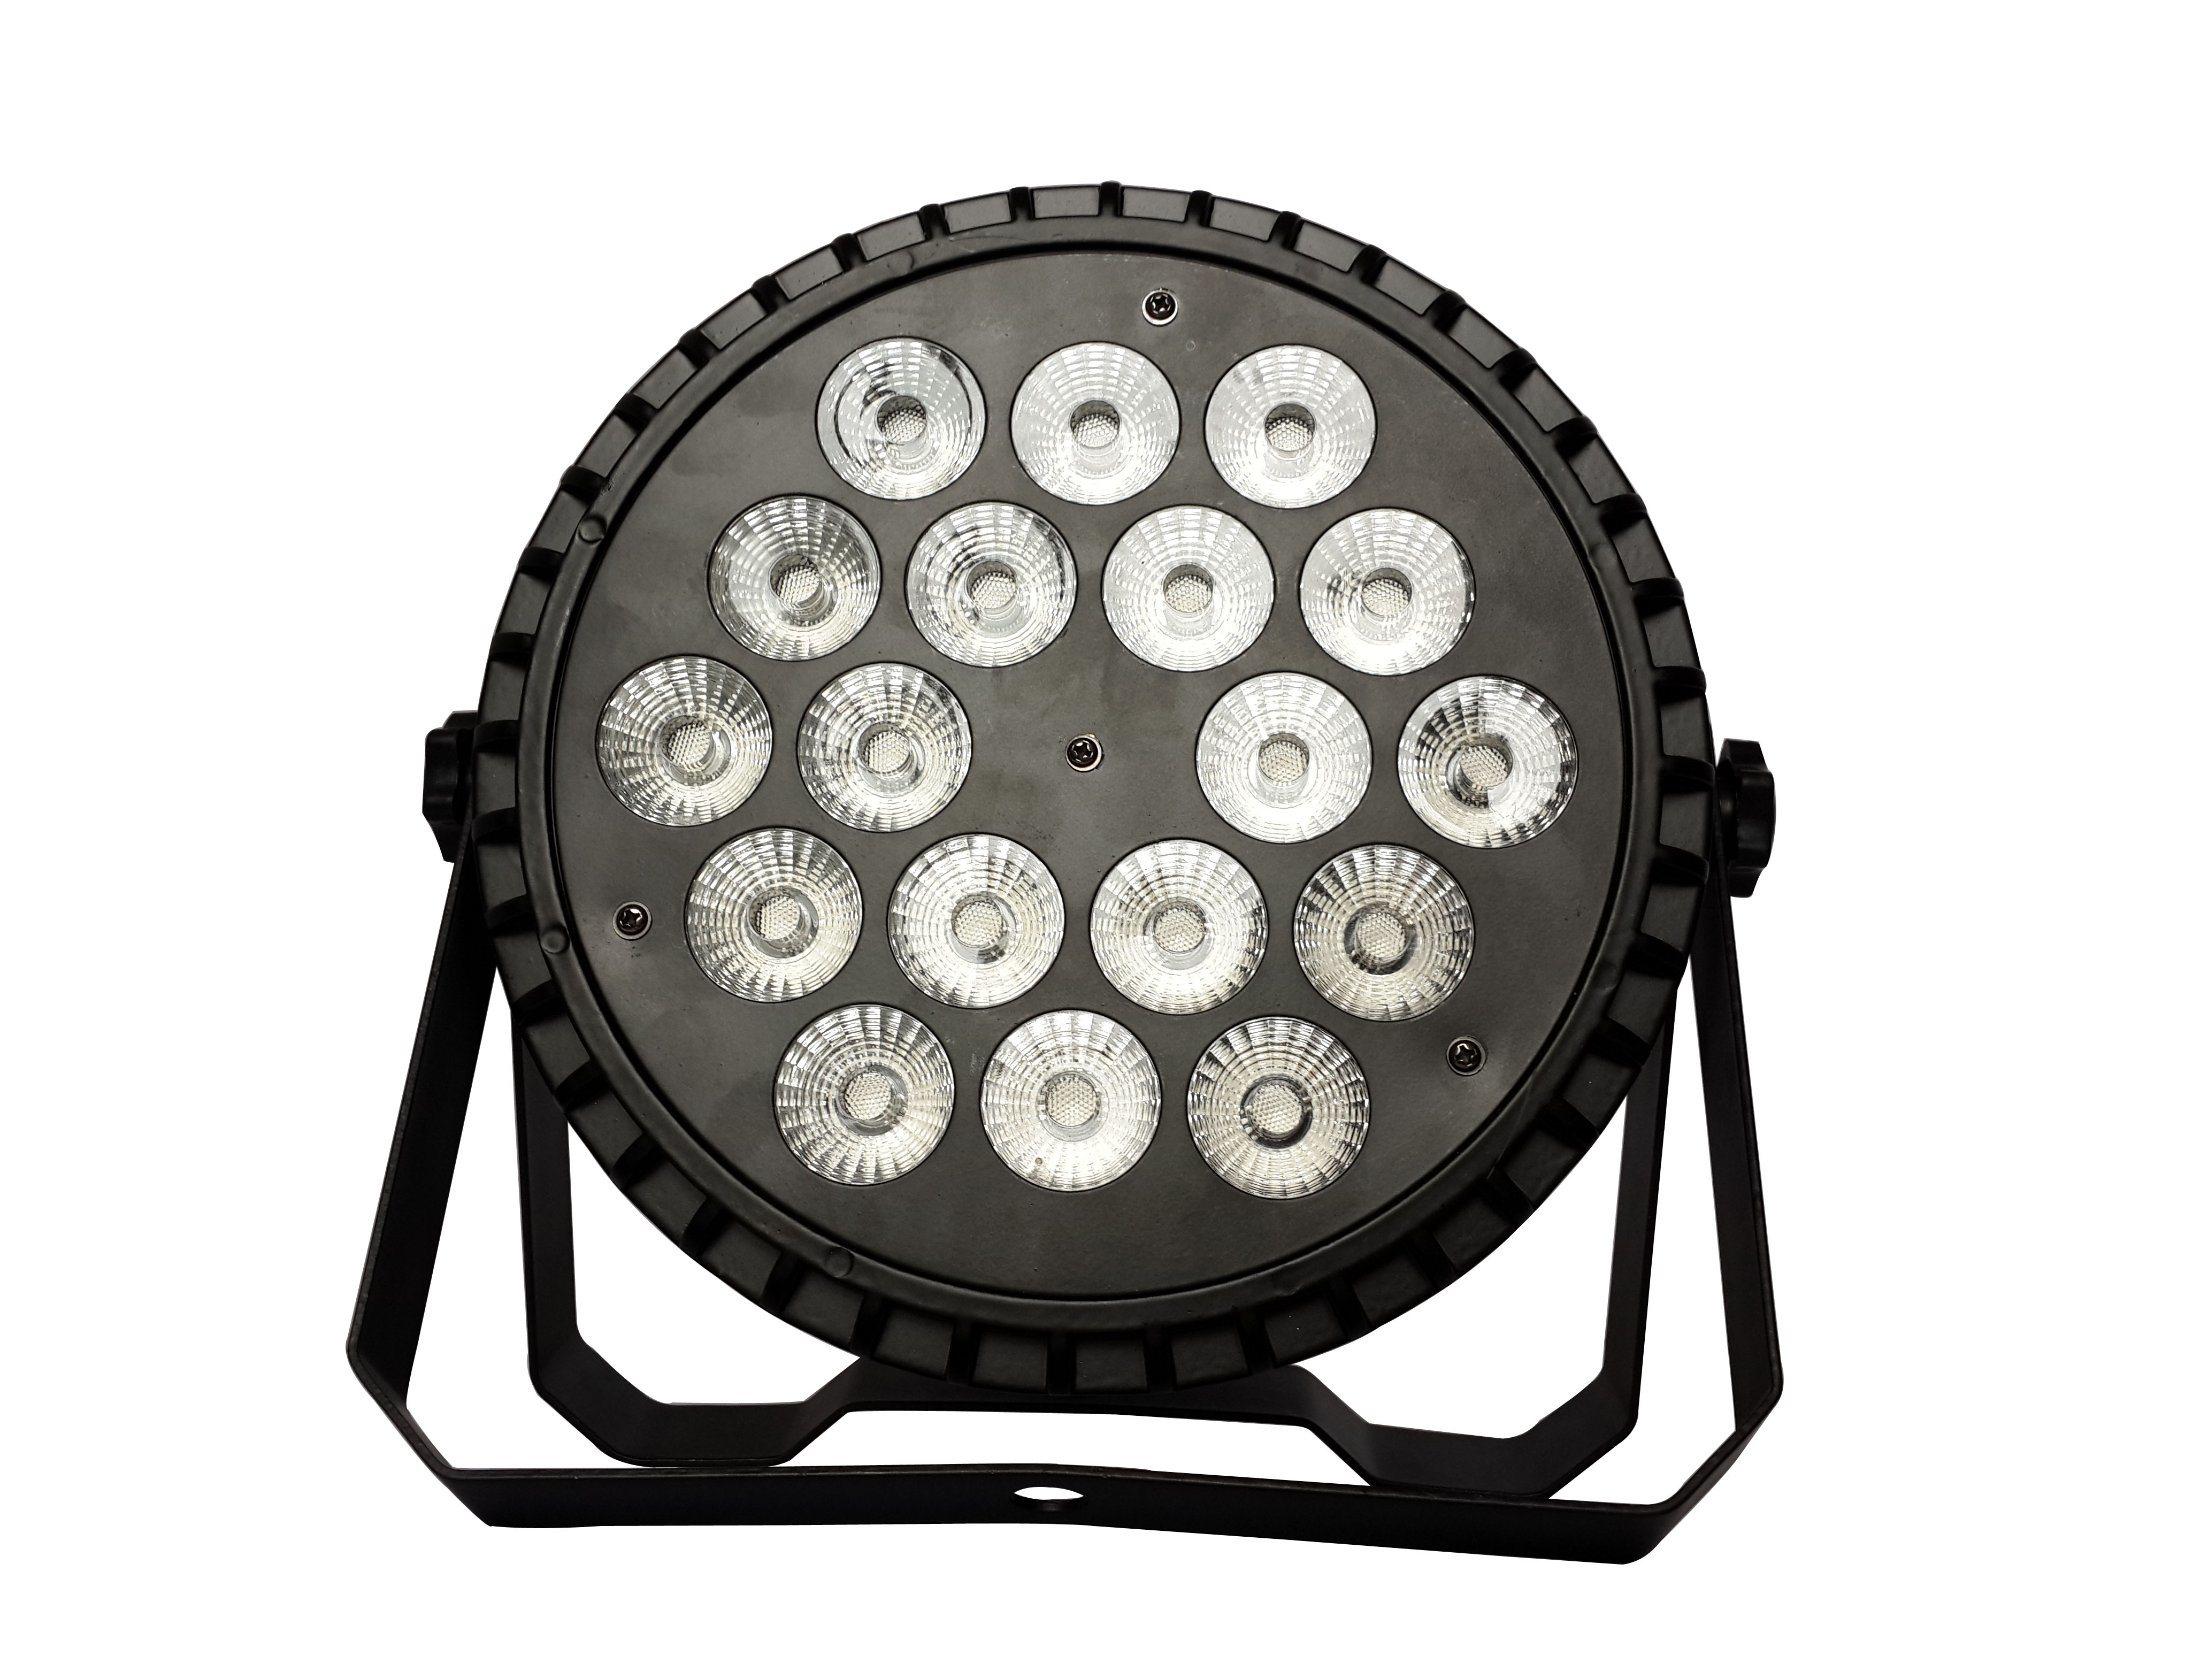 Outdoor Stage 18PCS 10W 4in1 LED RGBW Sky PAR Light